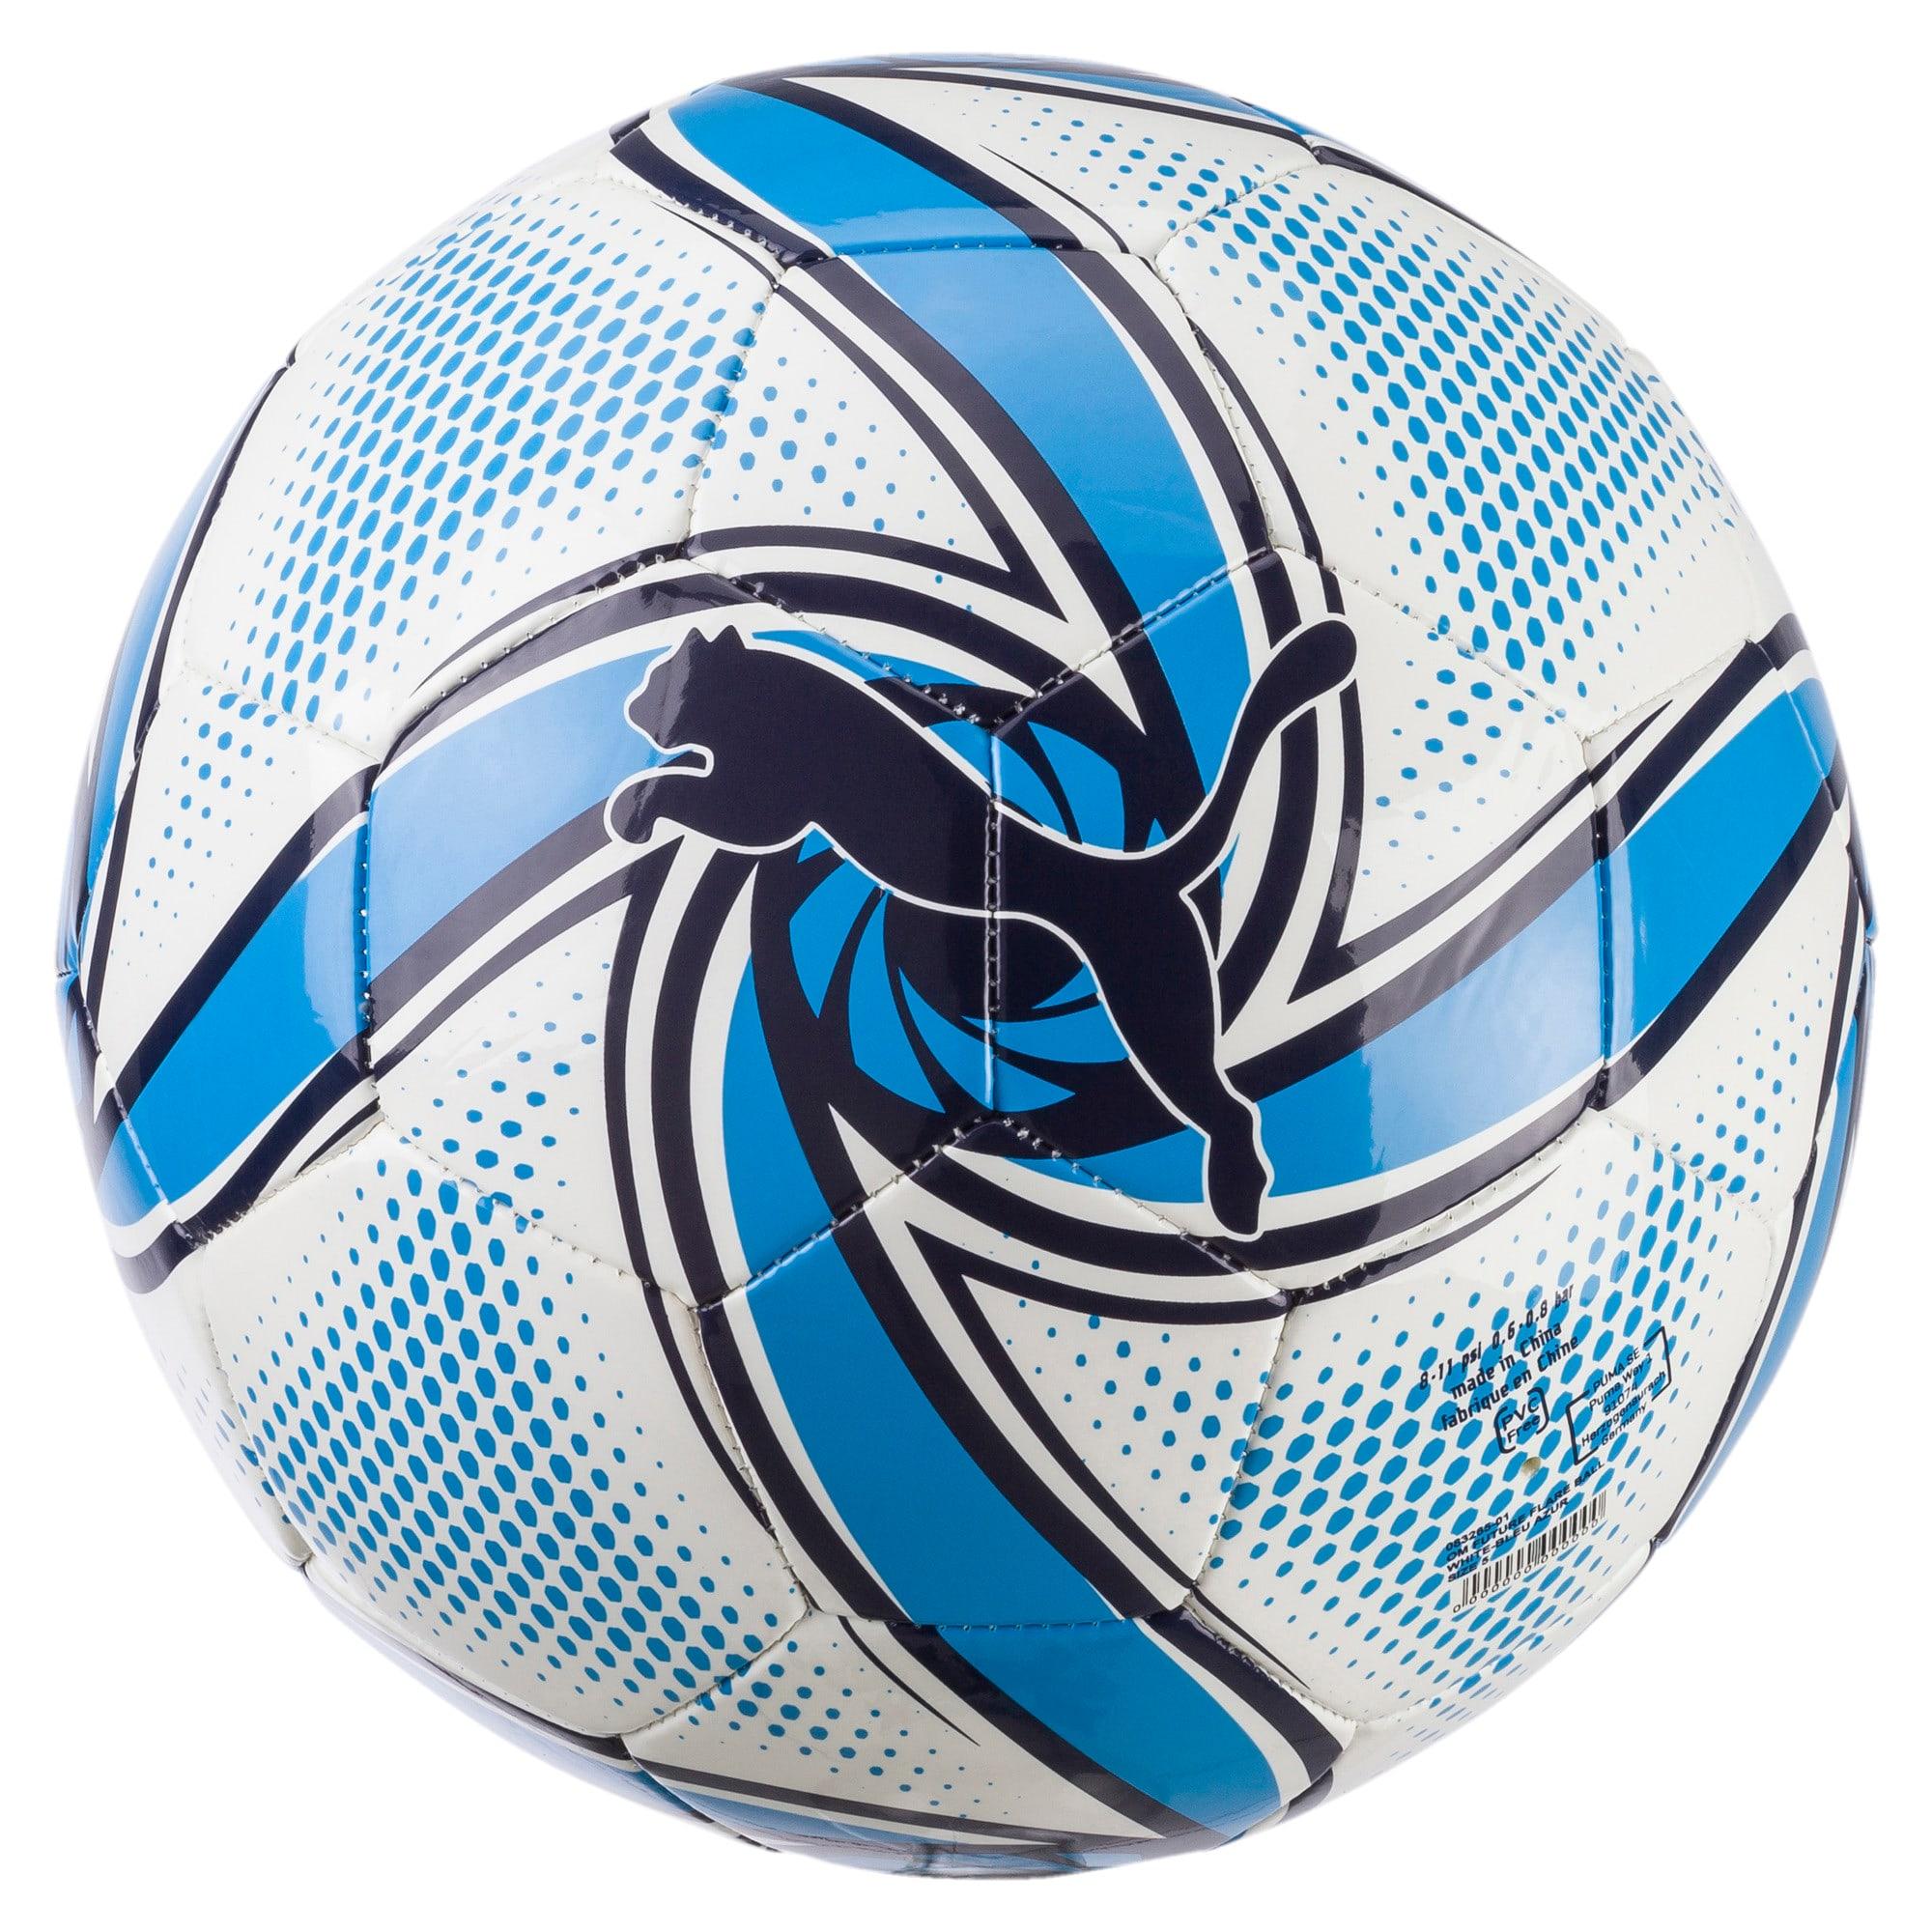 Thumbnail 1 of Ballon Olympique de Marseille FUTURE Flare, Puma White-Bleu Azur, medium